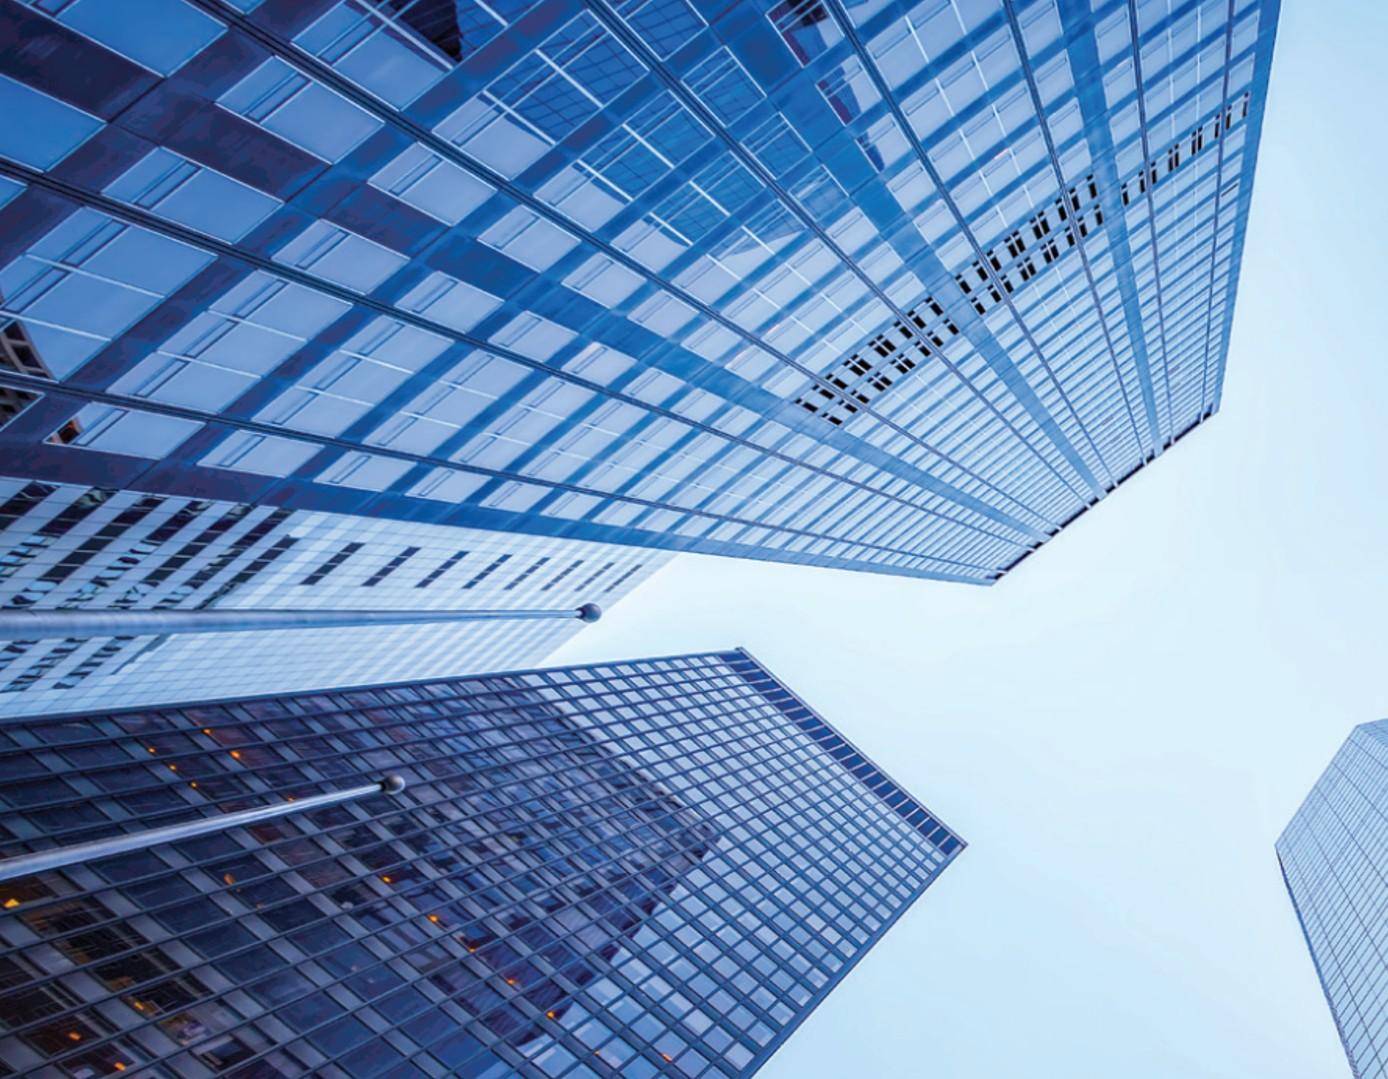 Ecker Window Corp | LinkedIn